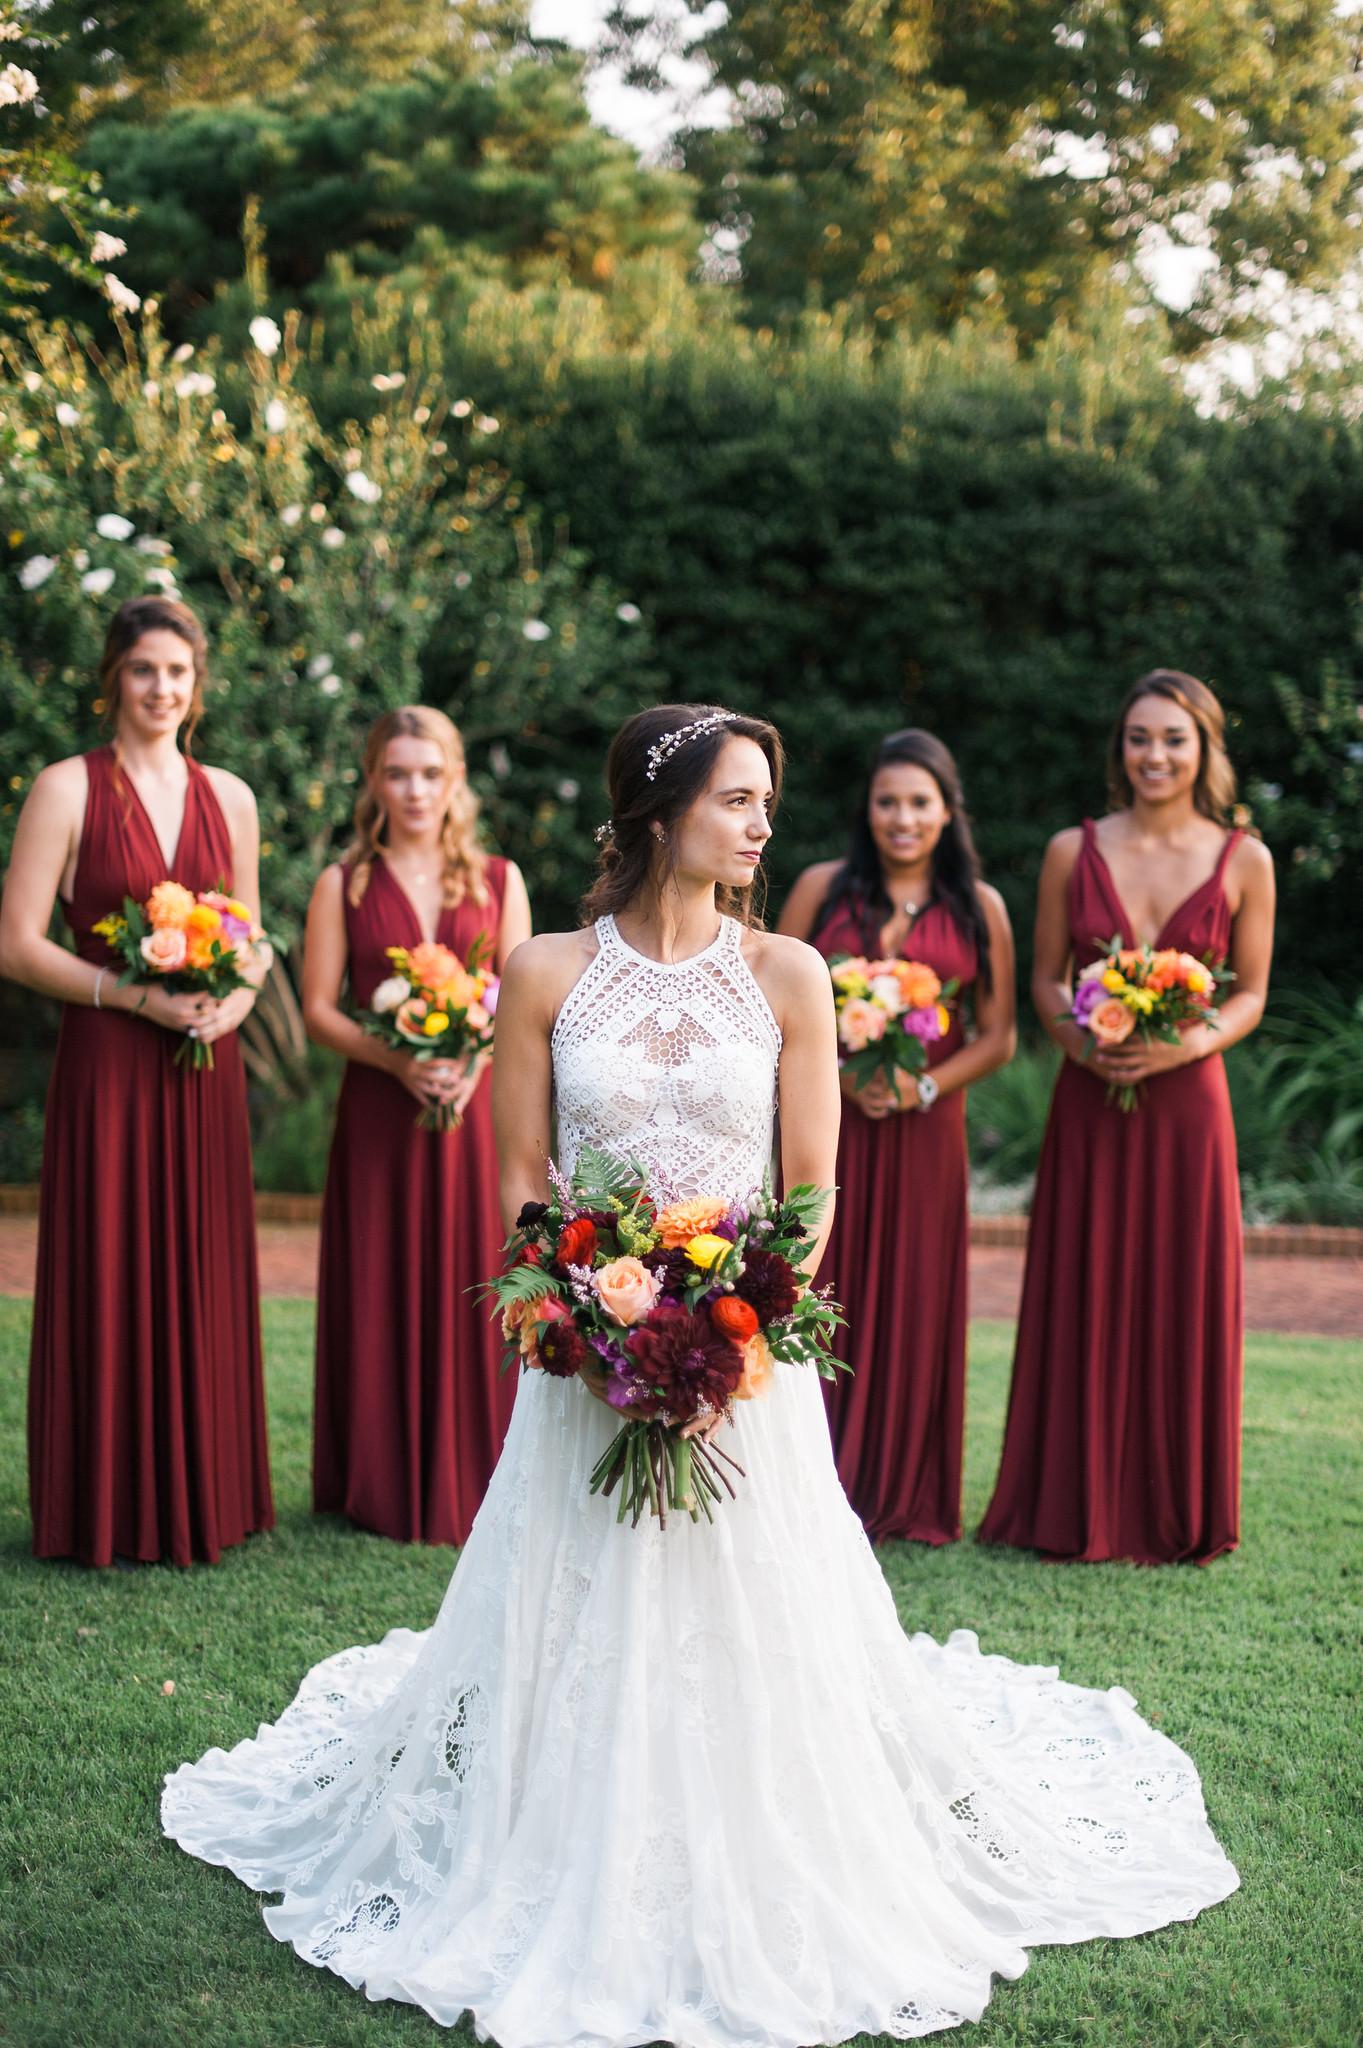 thomas-wedding-065-X4.jpg